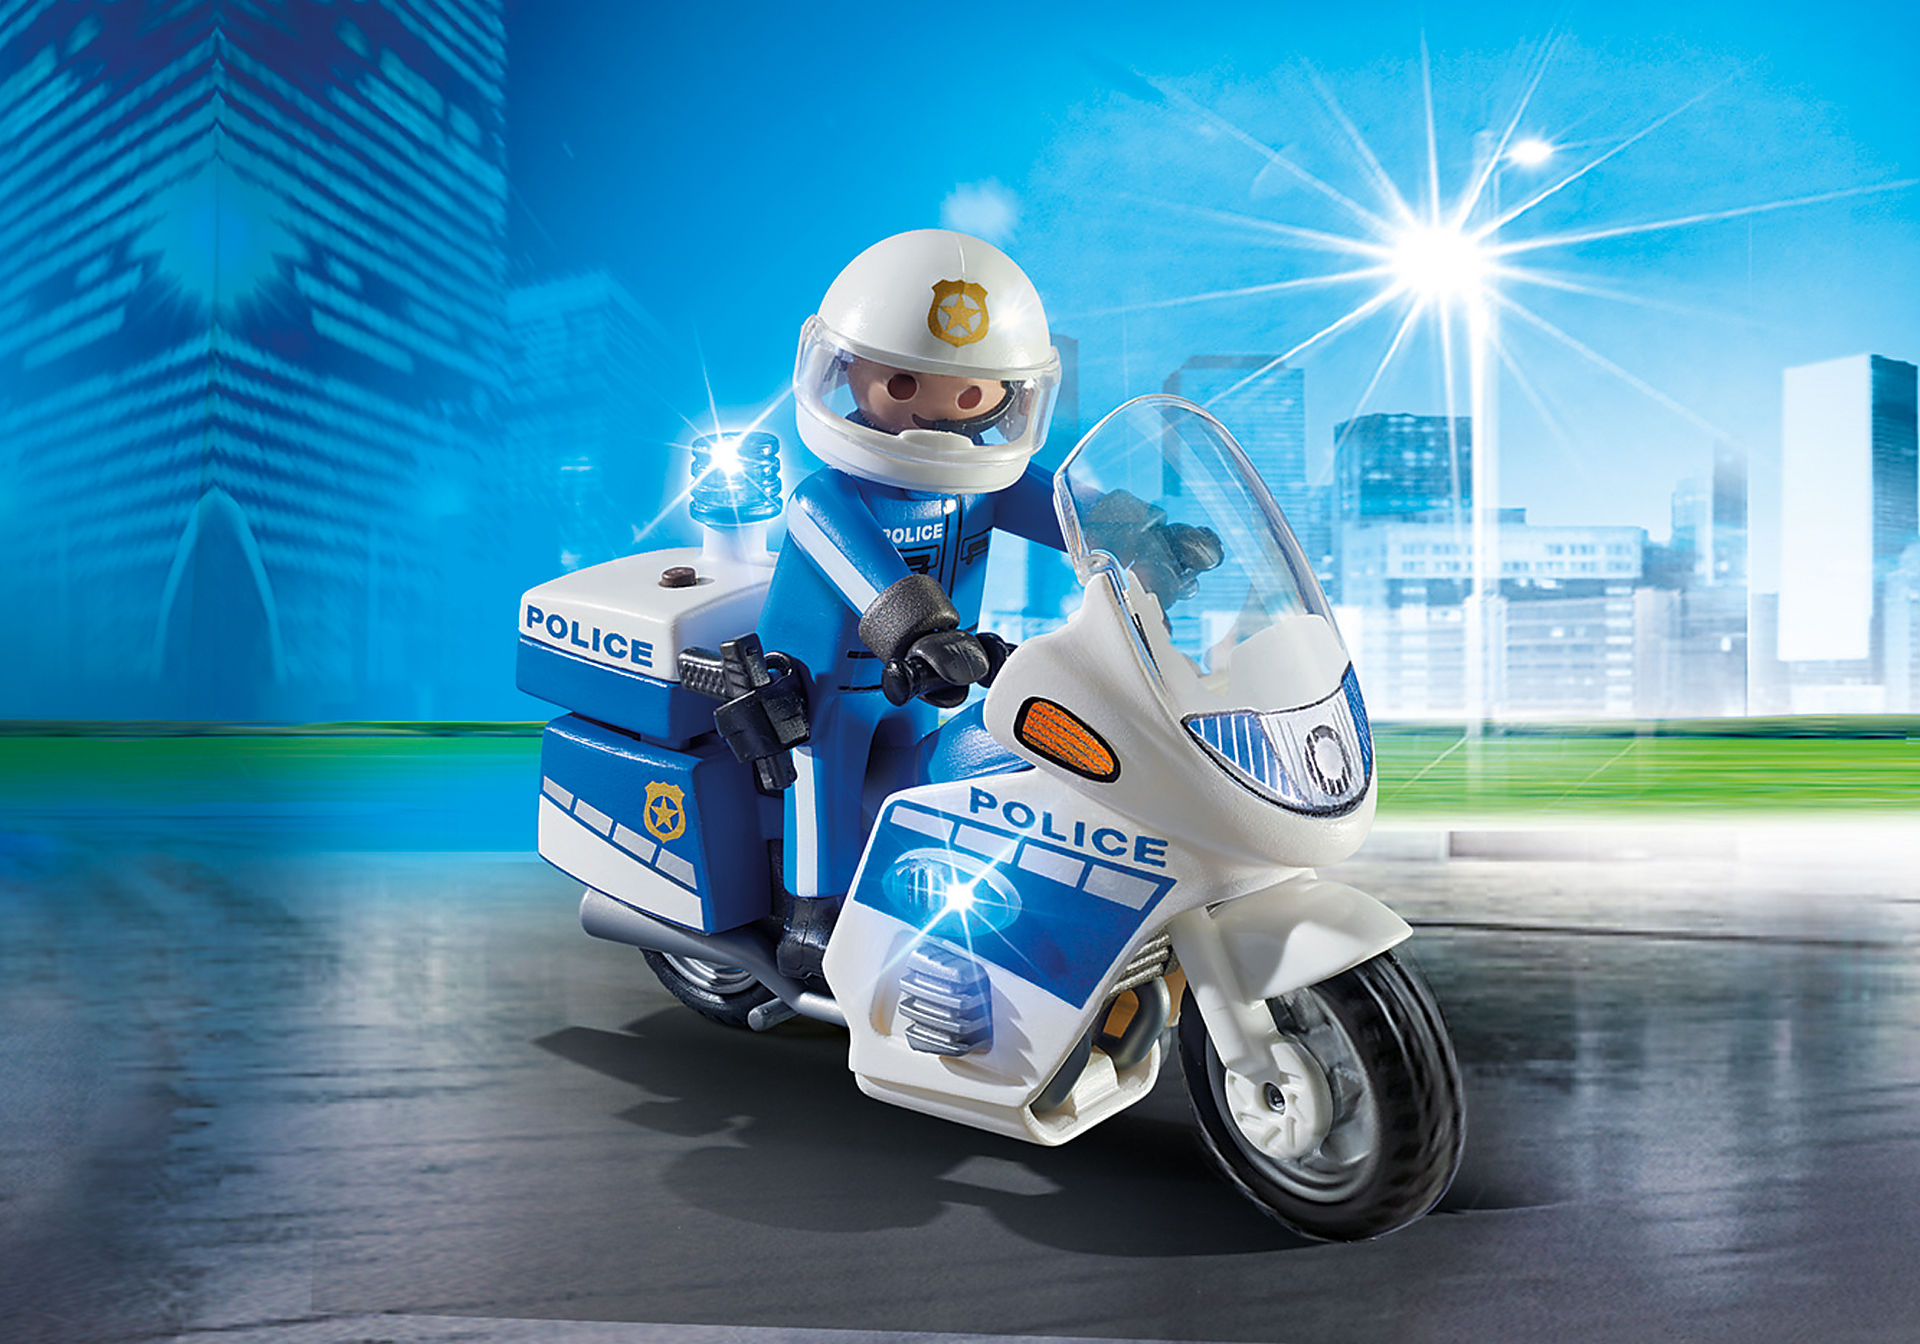 6923 Int. Motorradstreife mit LED-Blinklicht zoom image1